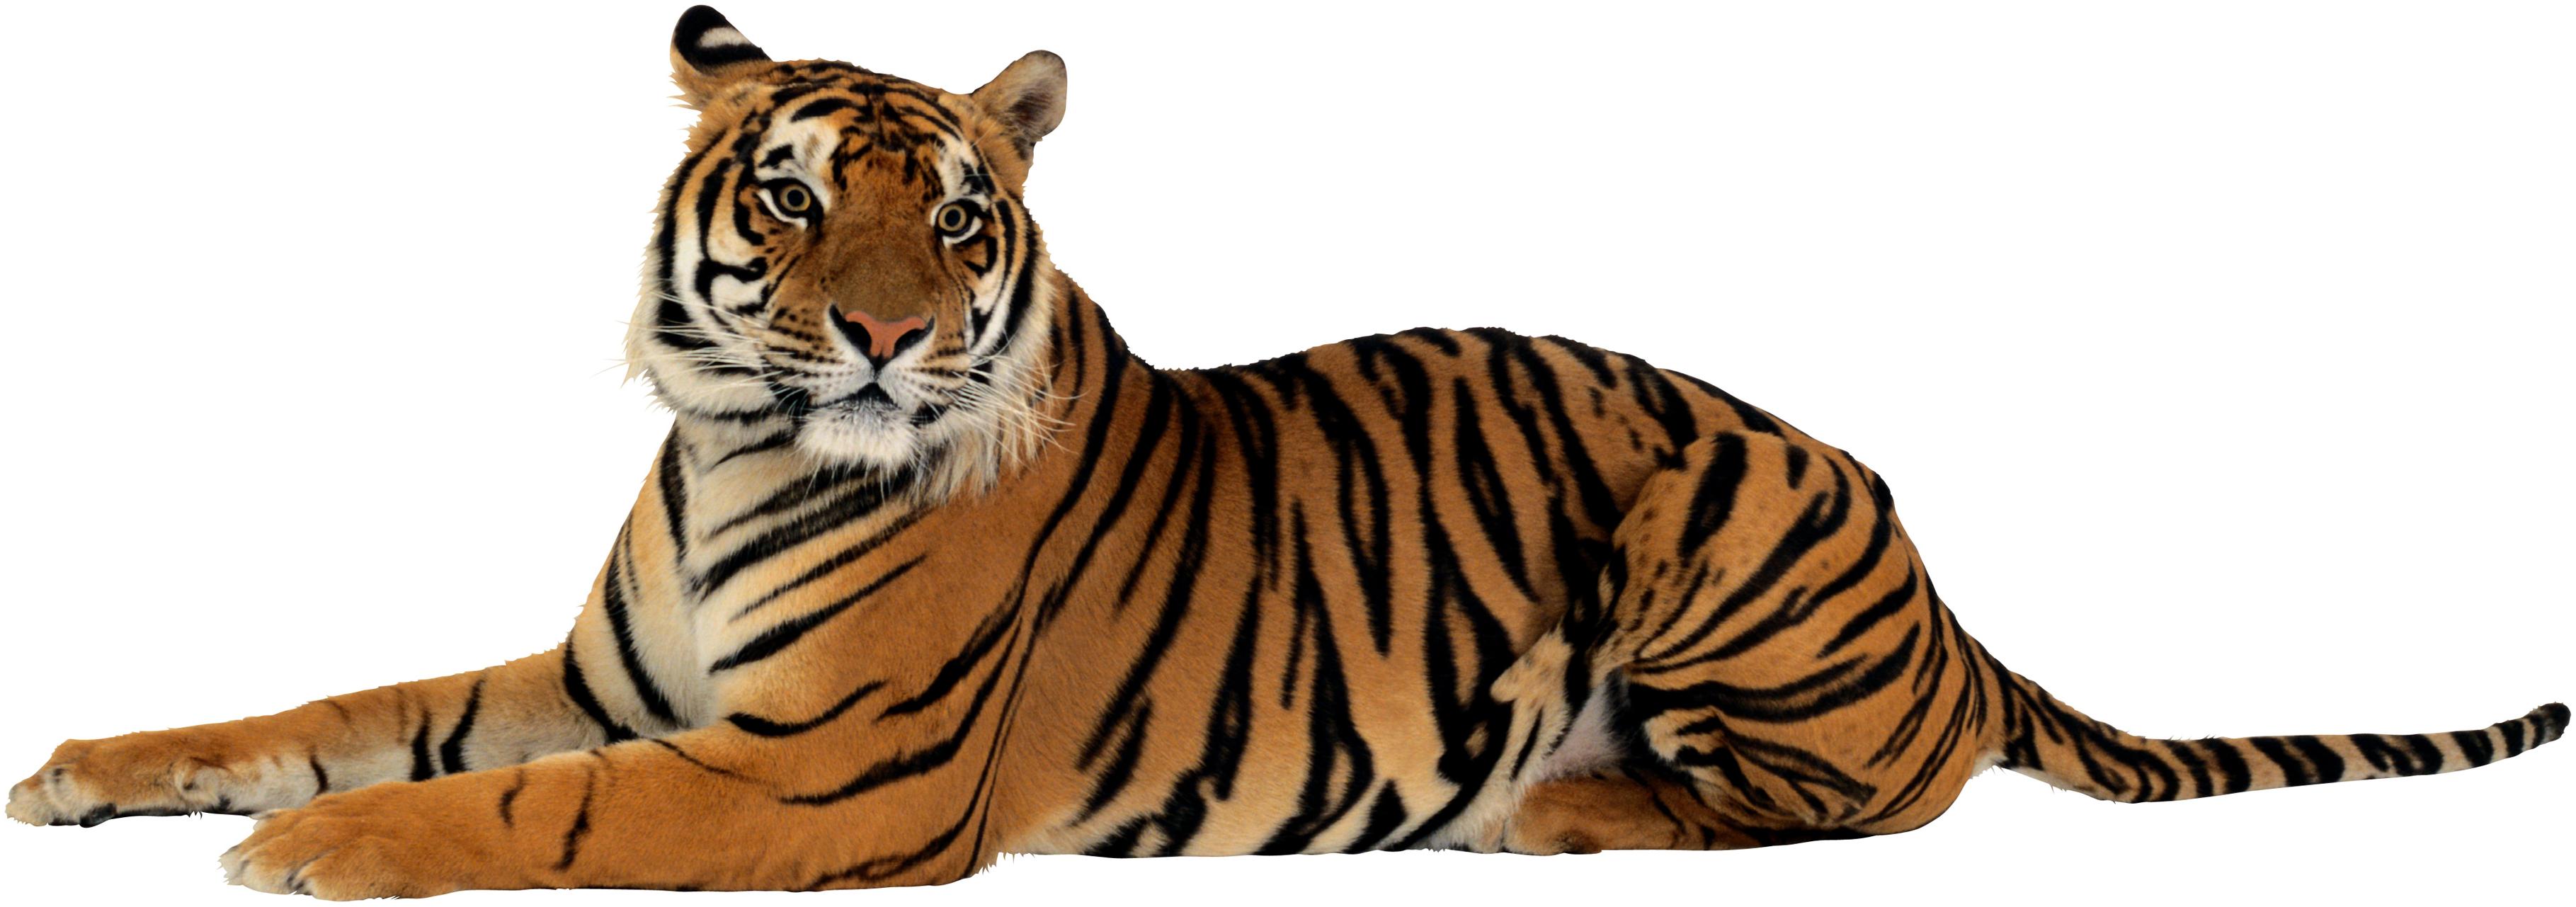 Download PNG Image   Tiger Png File